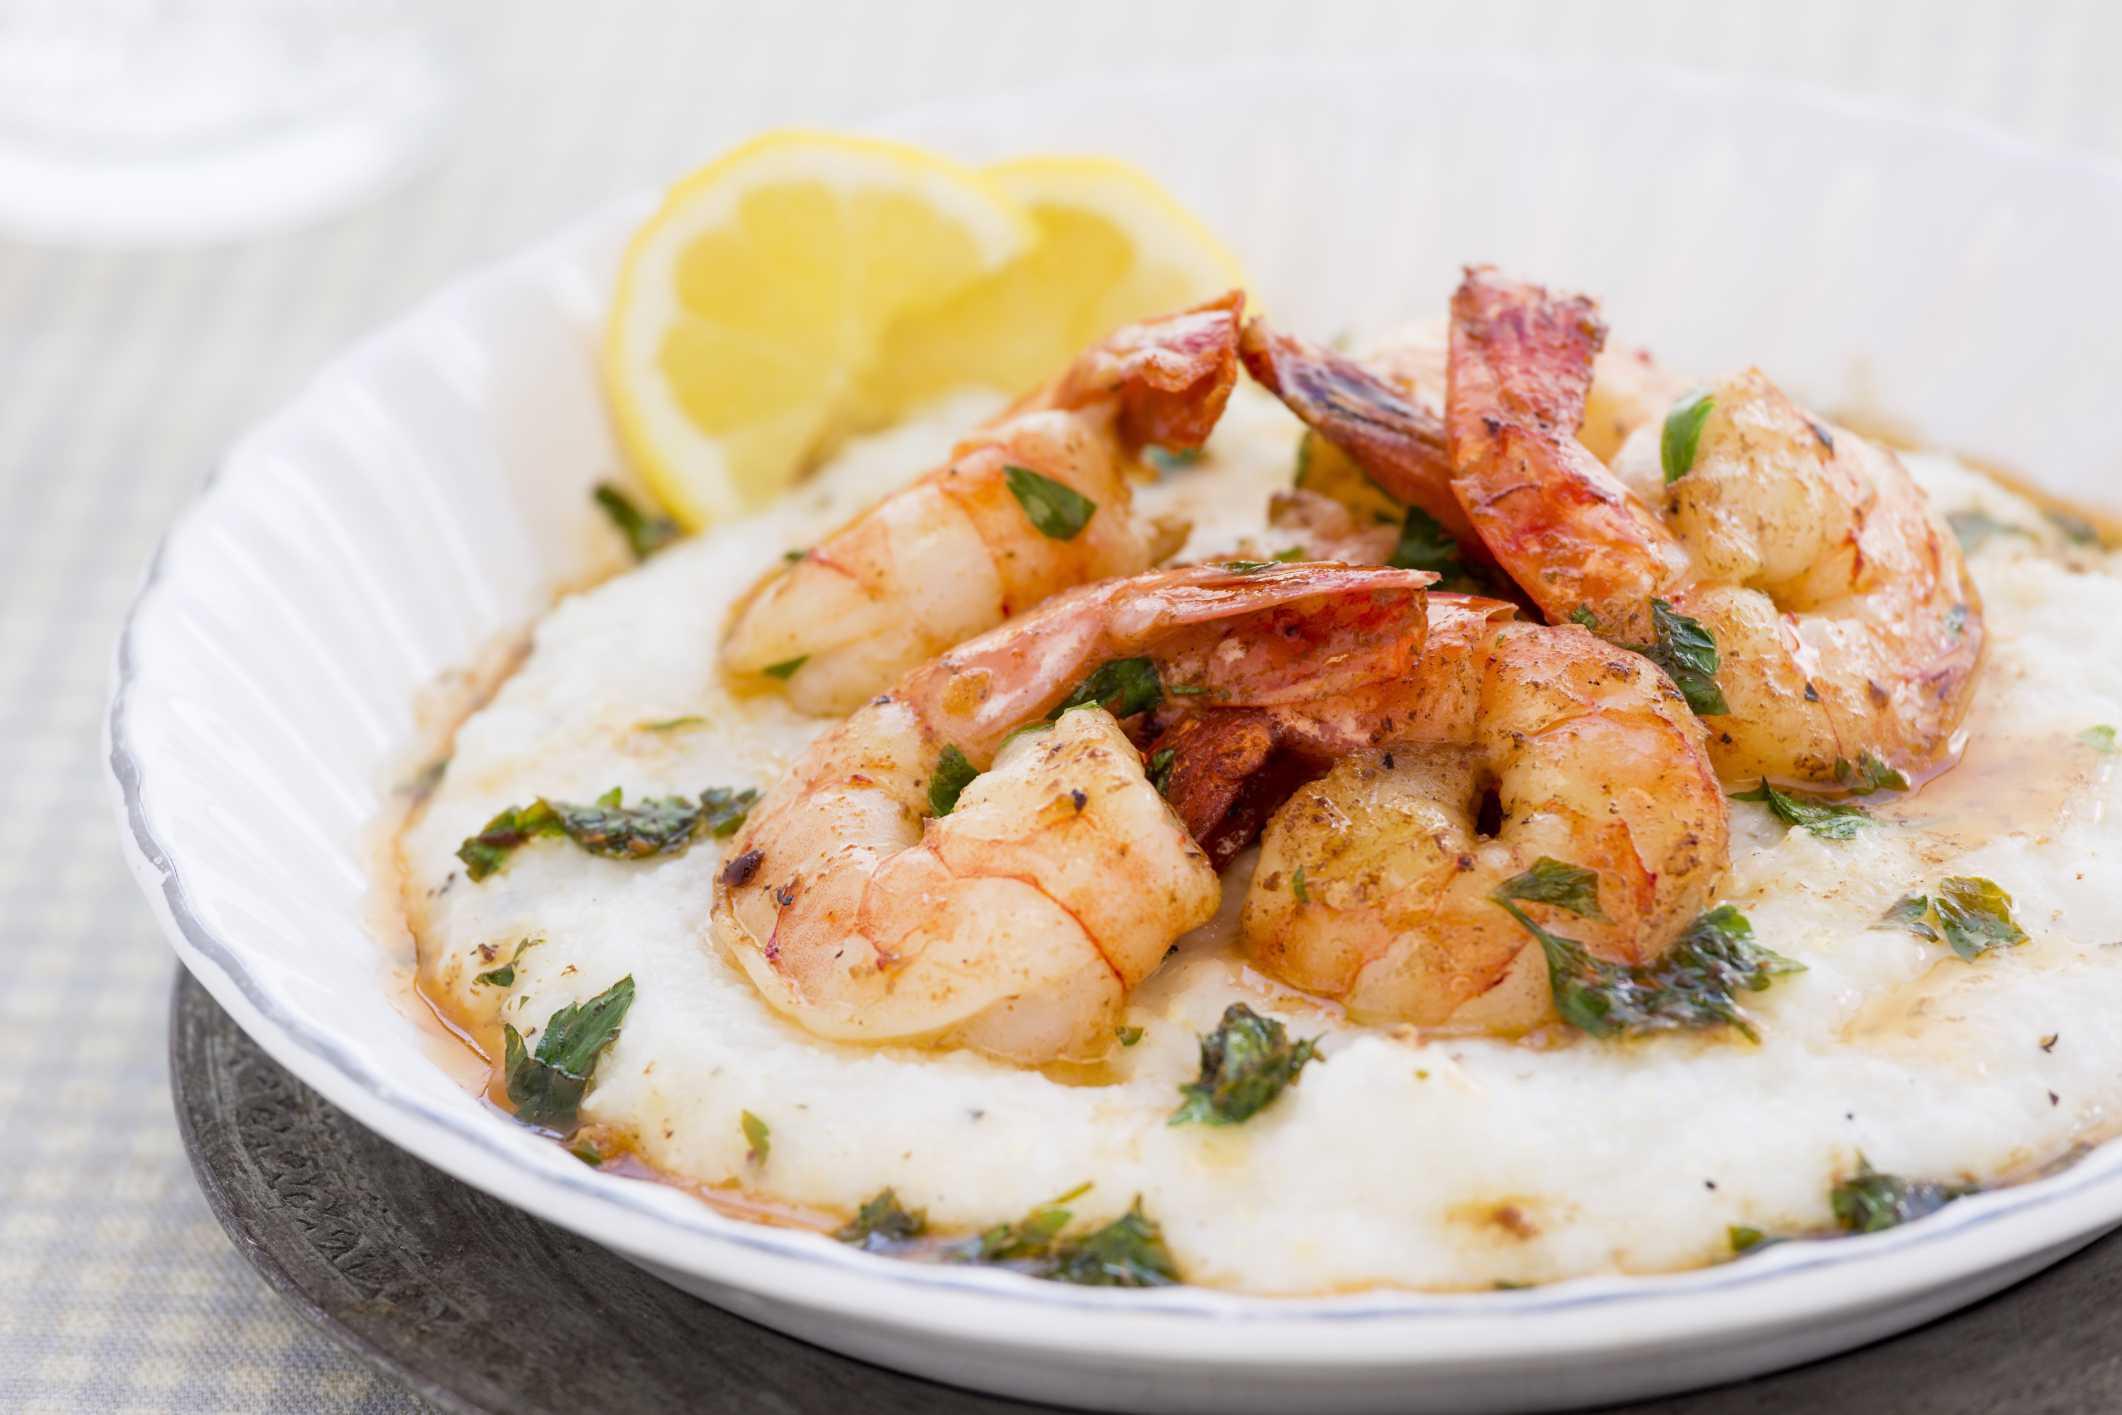 Crock pot shrimp and grits with lemon wedges